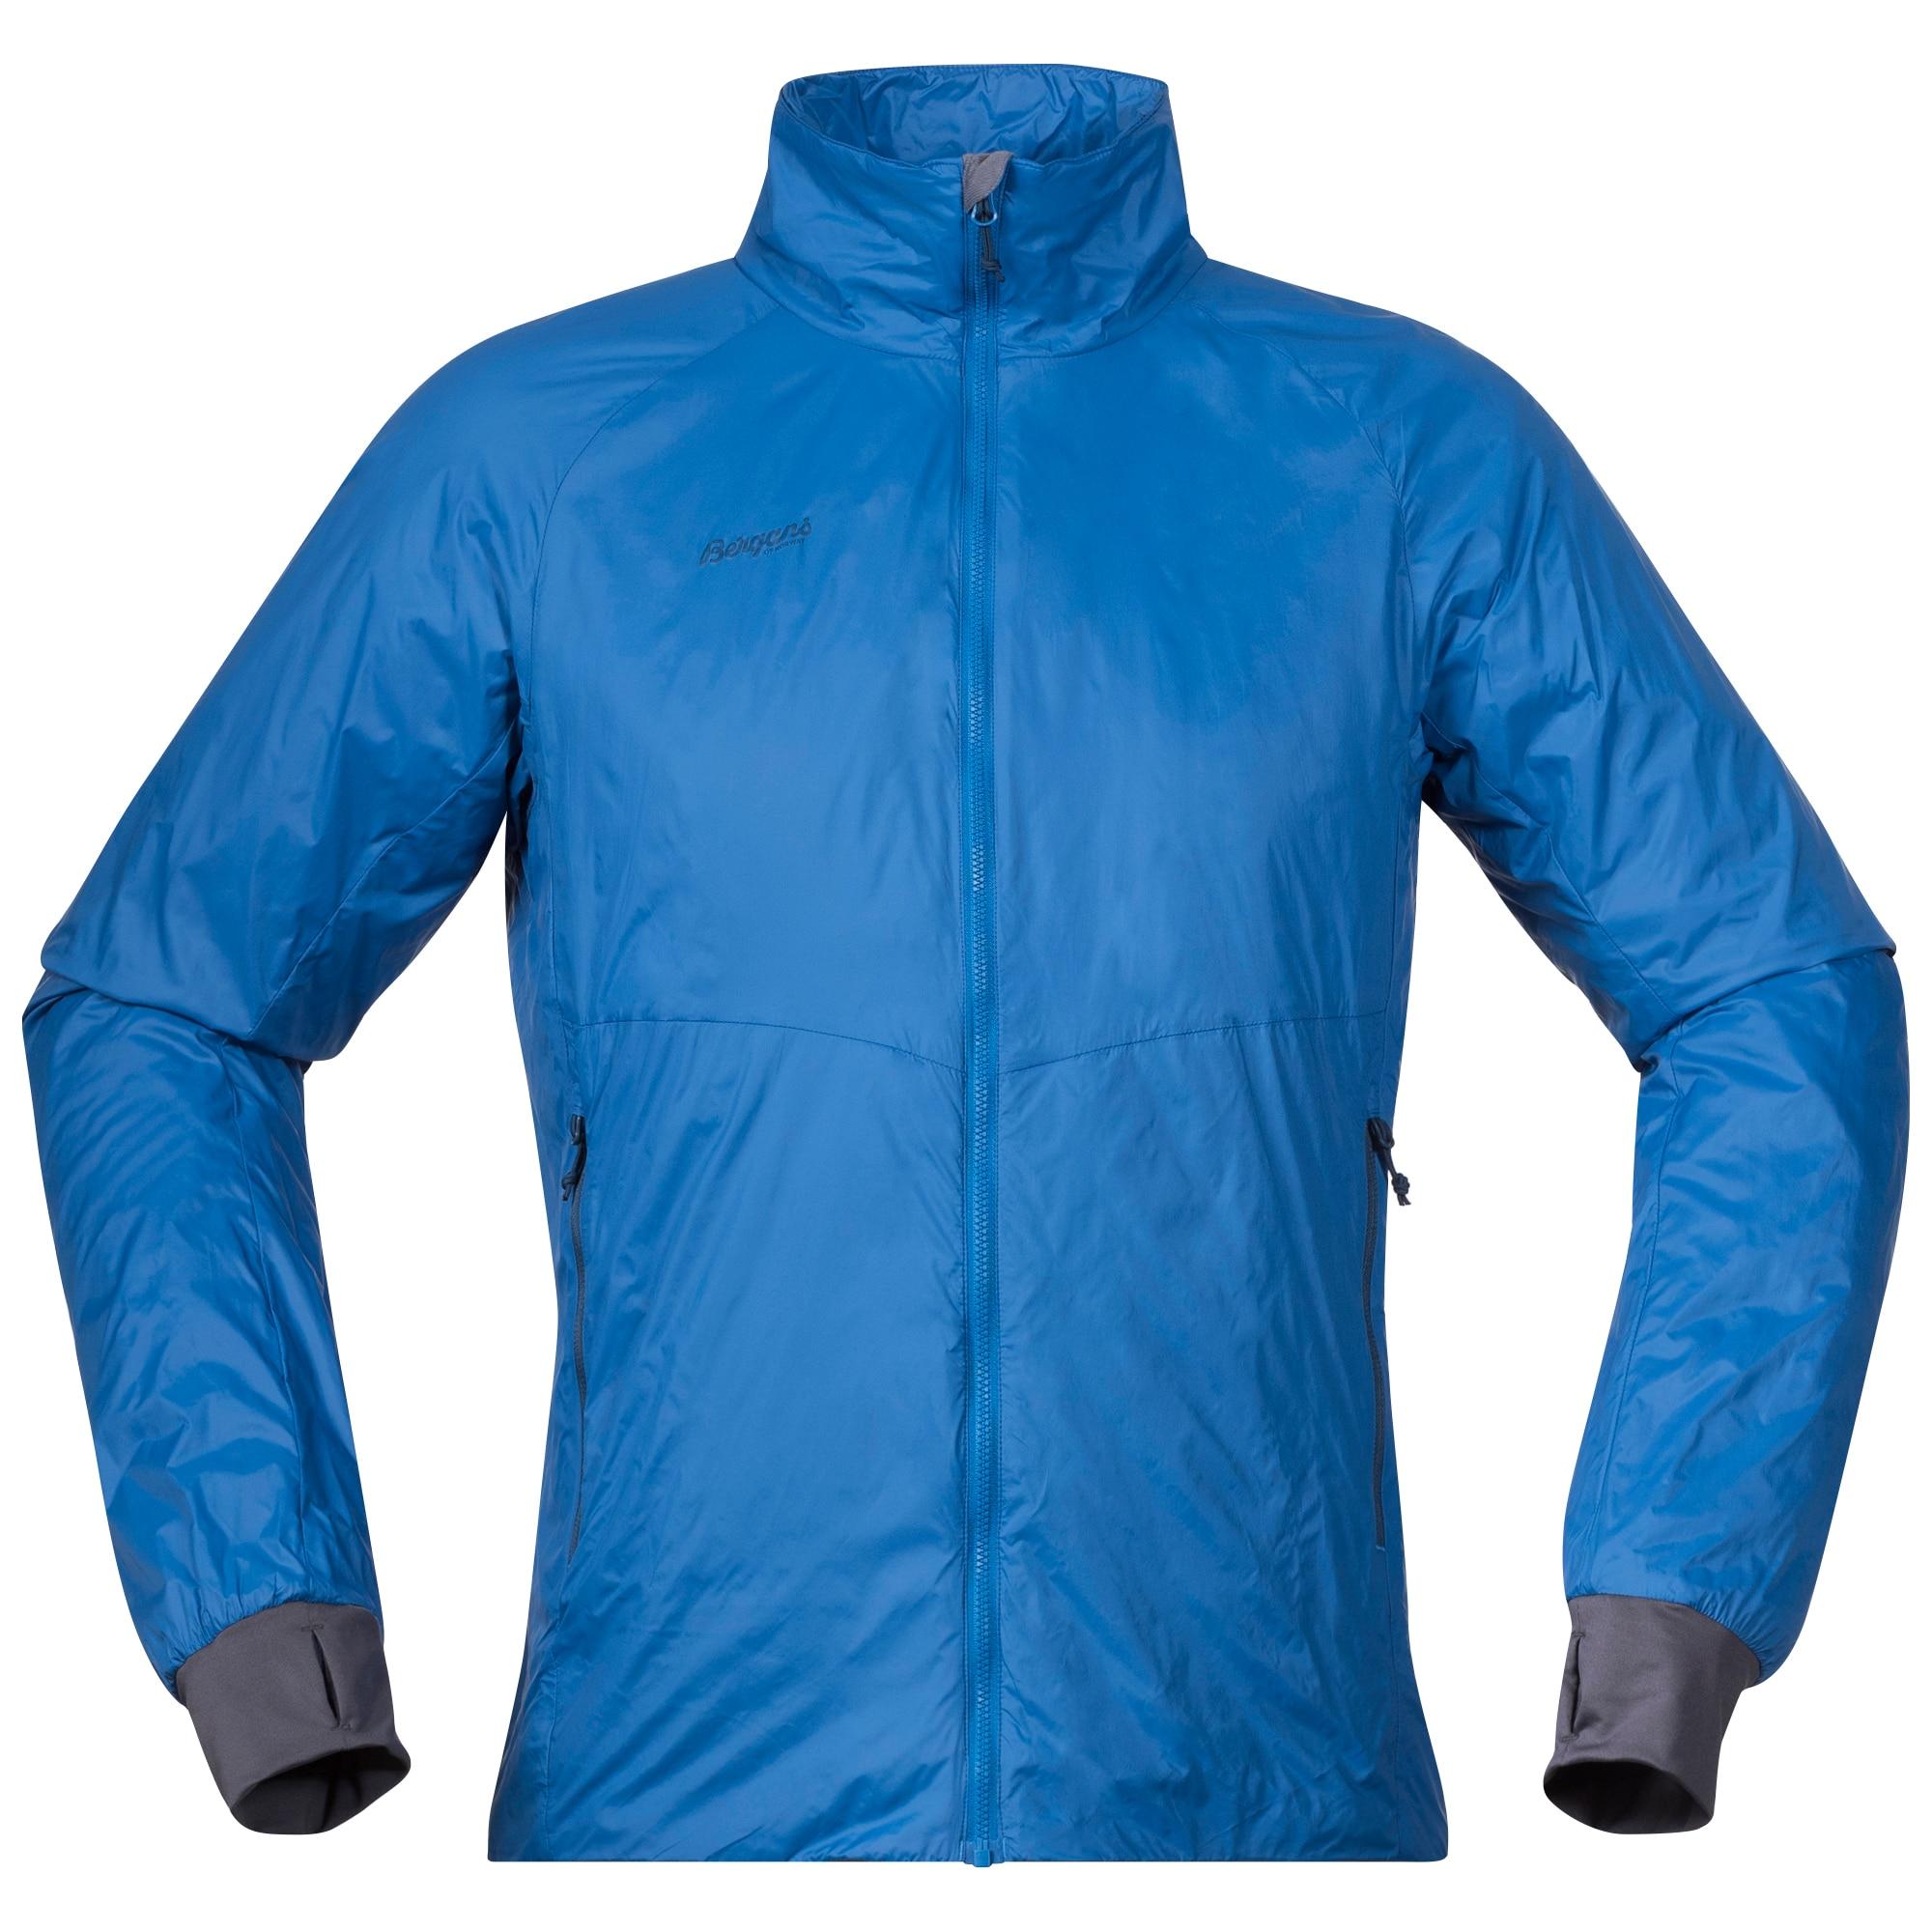 Lom Light Insulated Jacket